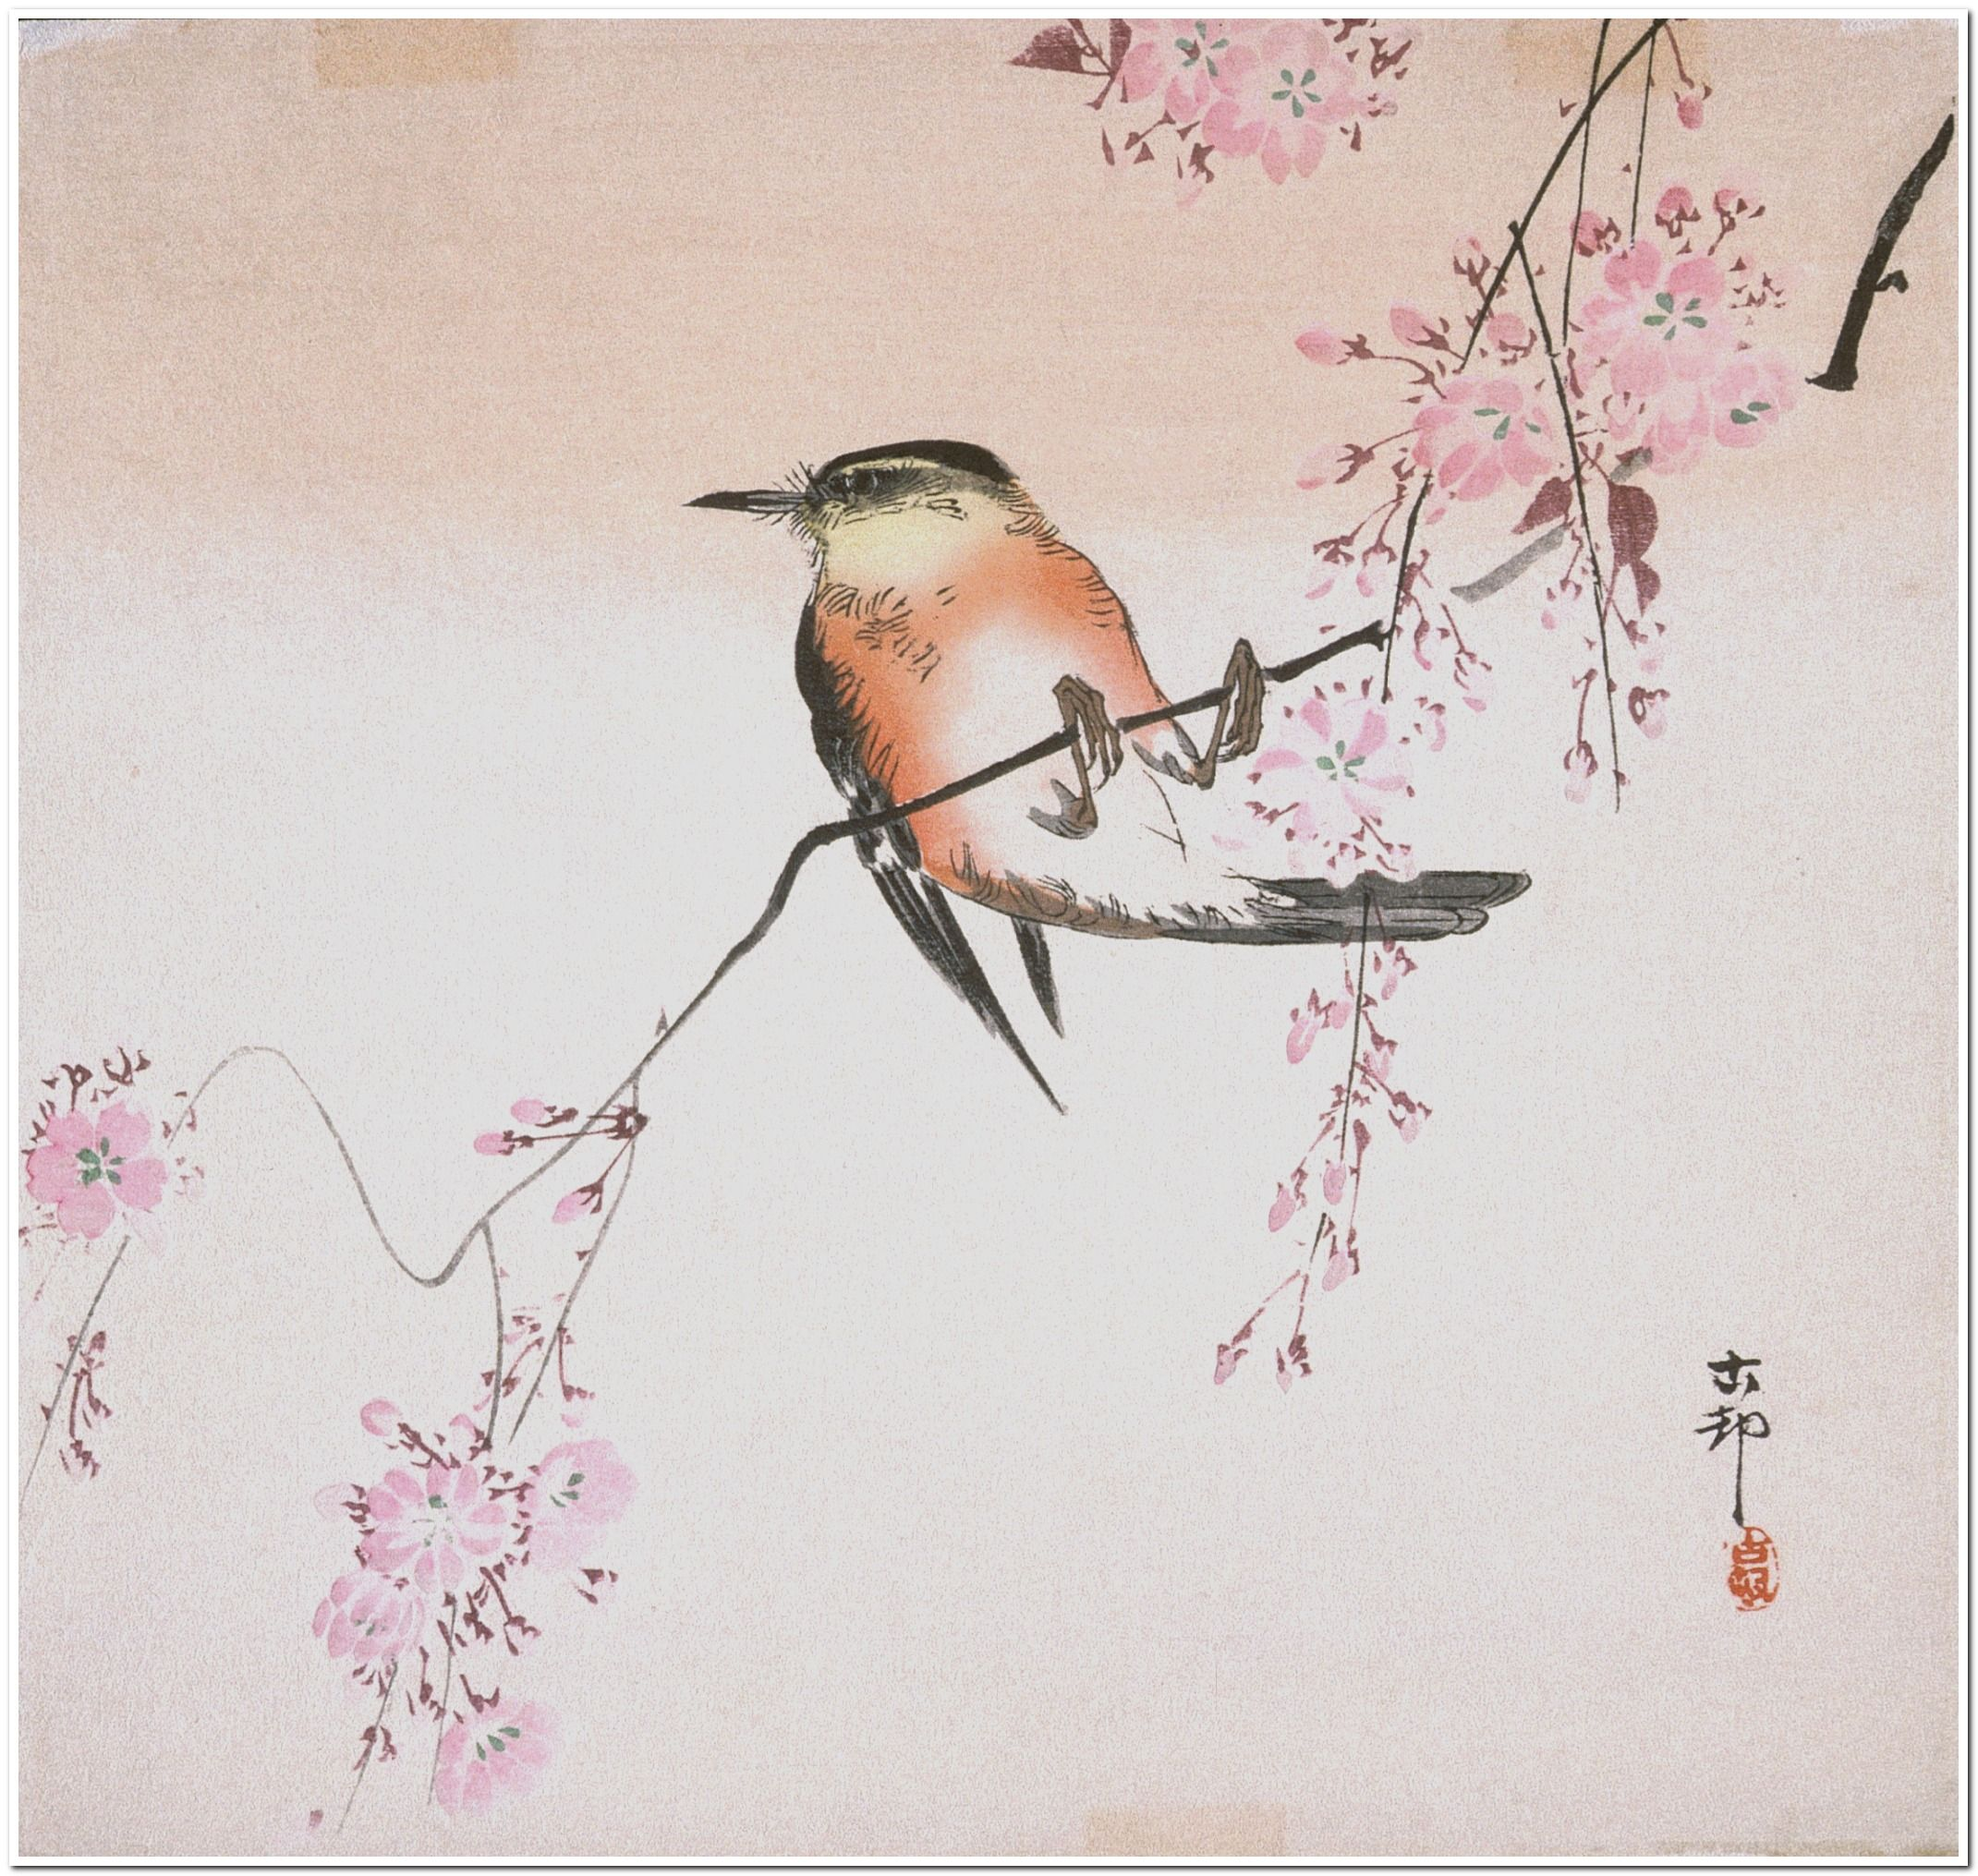 Bird on Weeping Cherry Ohara Shōson (Koson) (Japan, 1877-1945) Japan, early 20th century Prints; woodcuts Color woodblock print